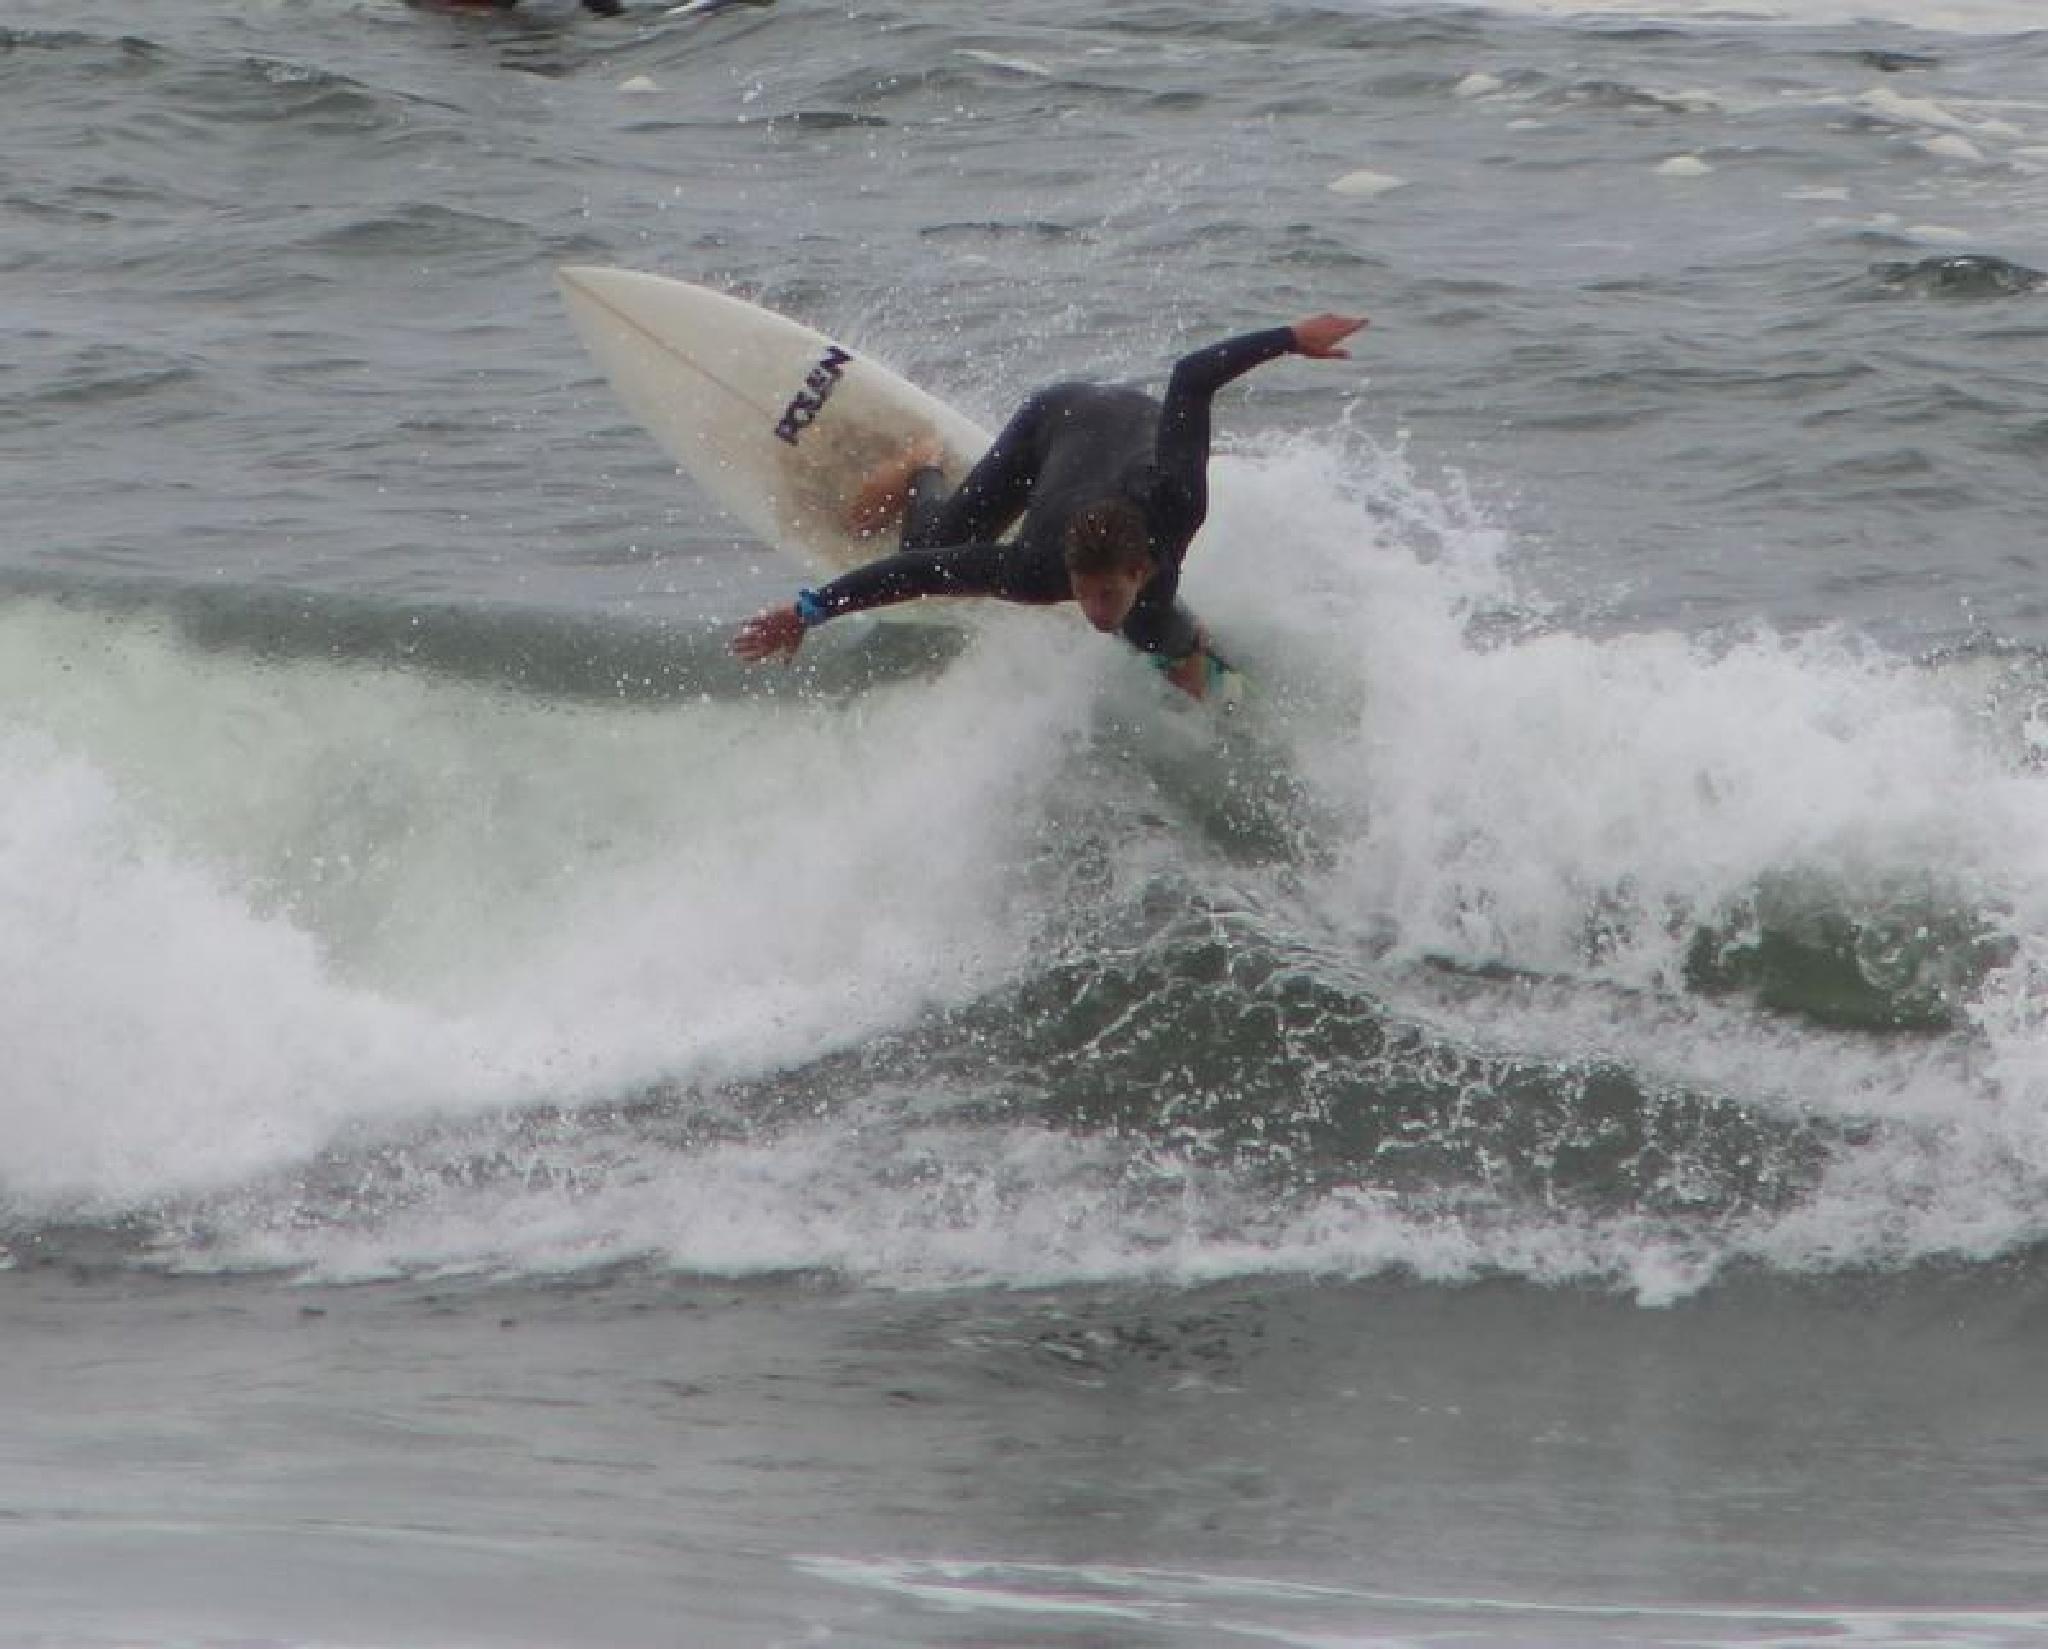 Surfing by Antero Costa